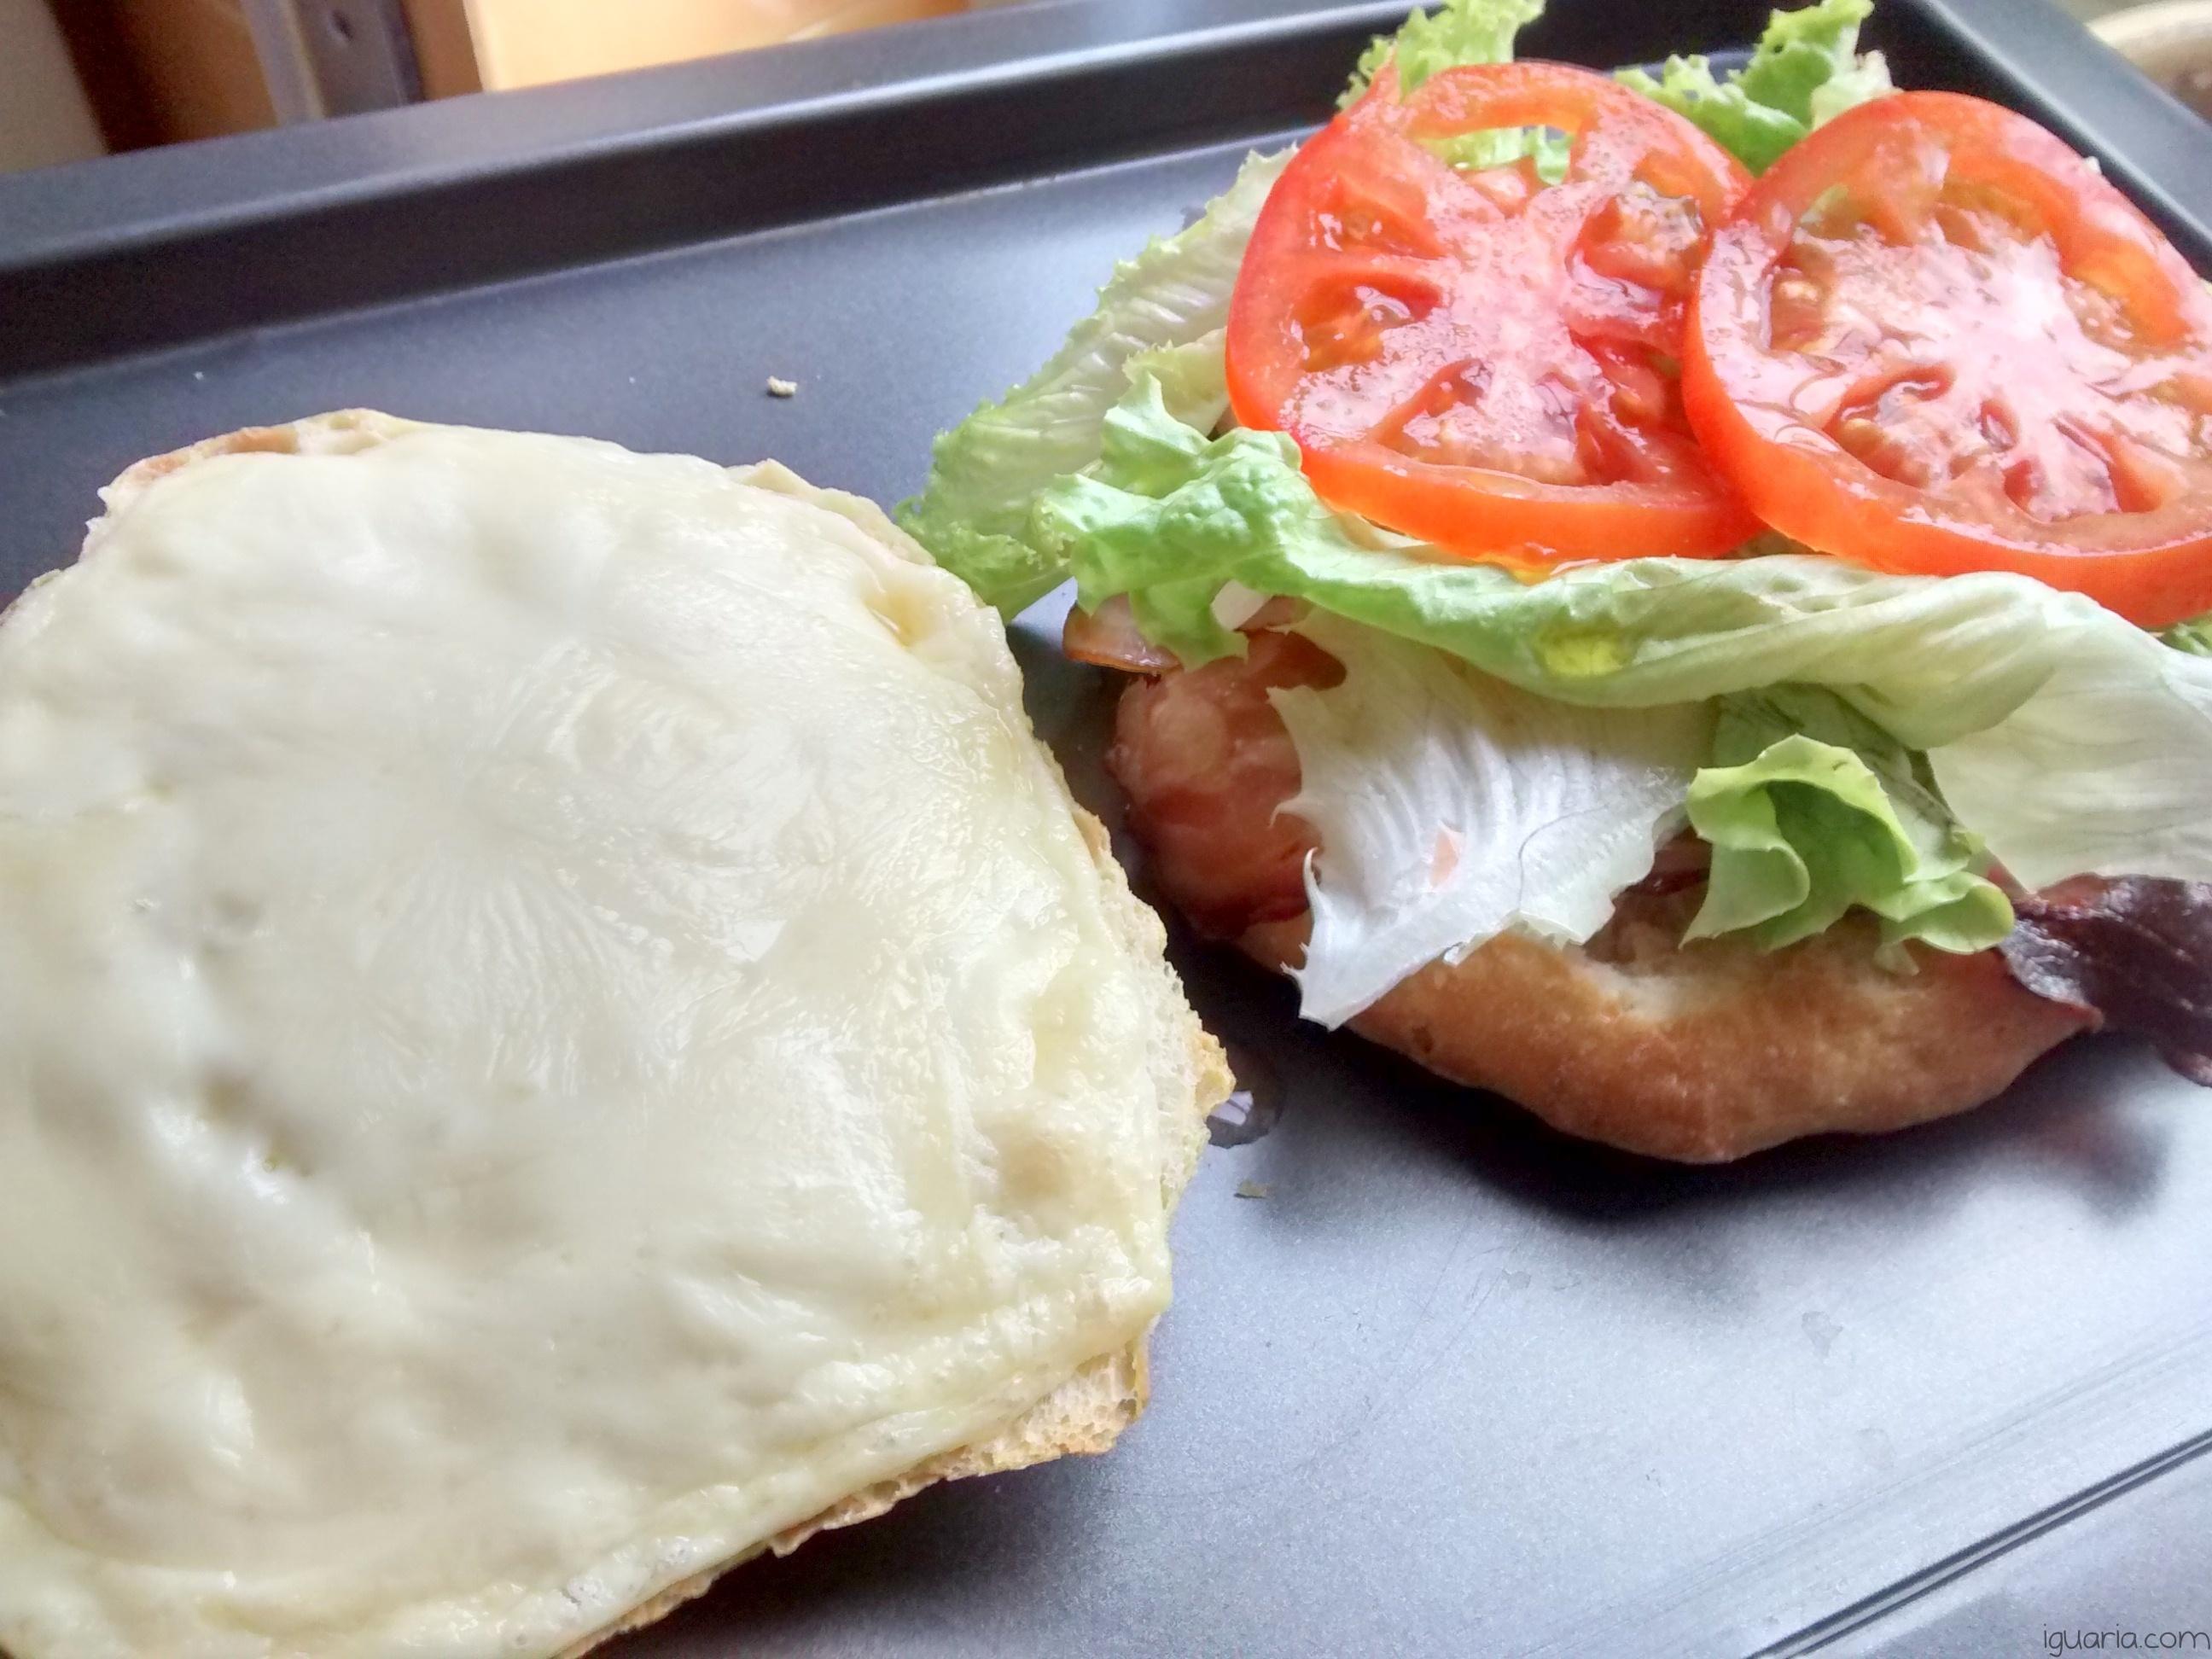 Iguaria_Sandes-Aberta-Queijo-Salada